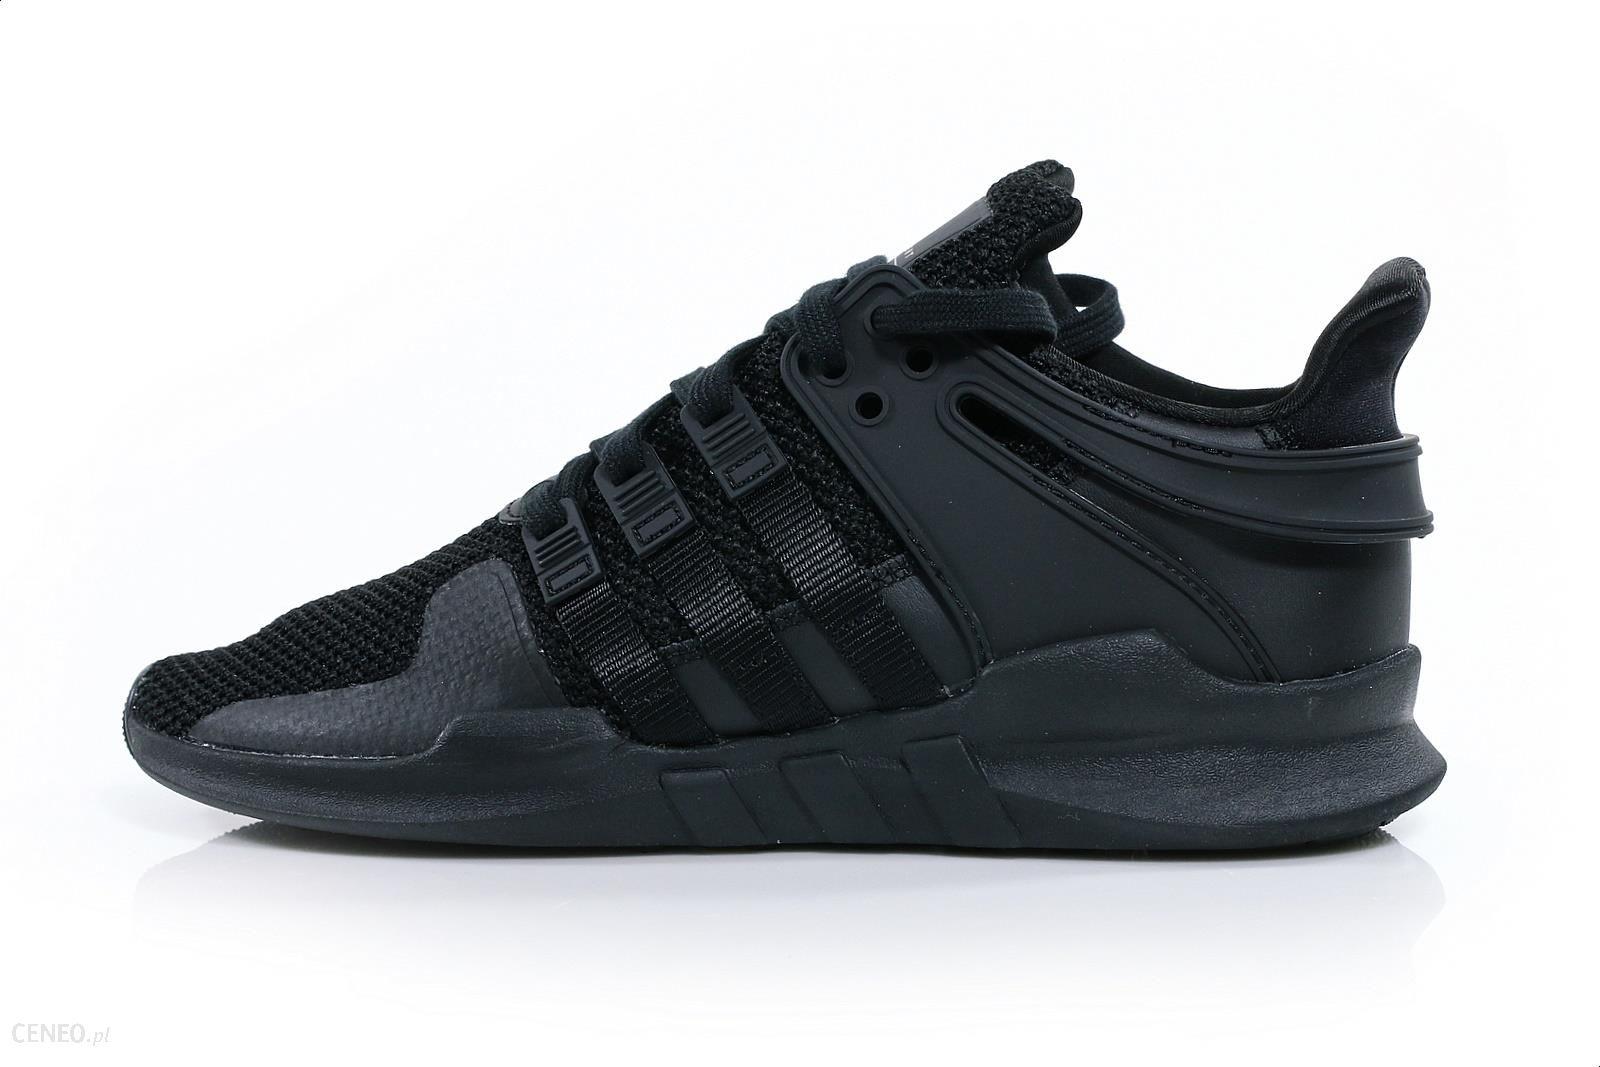 Buty męskie Adidas Eqt Support ADV CP8928 r.42,5